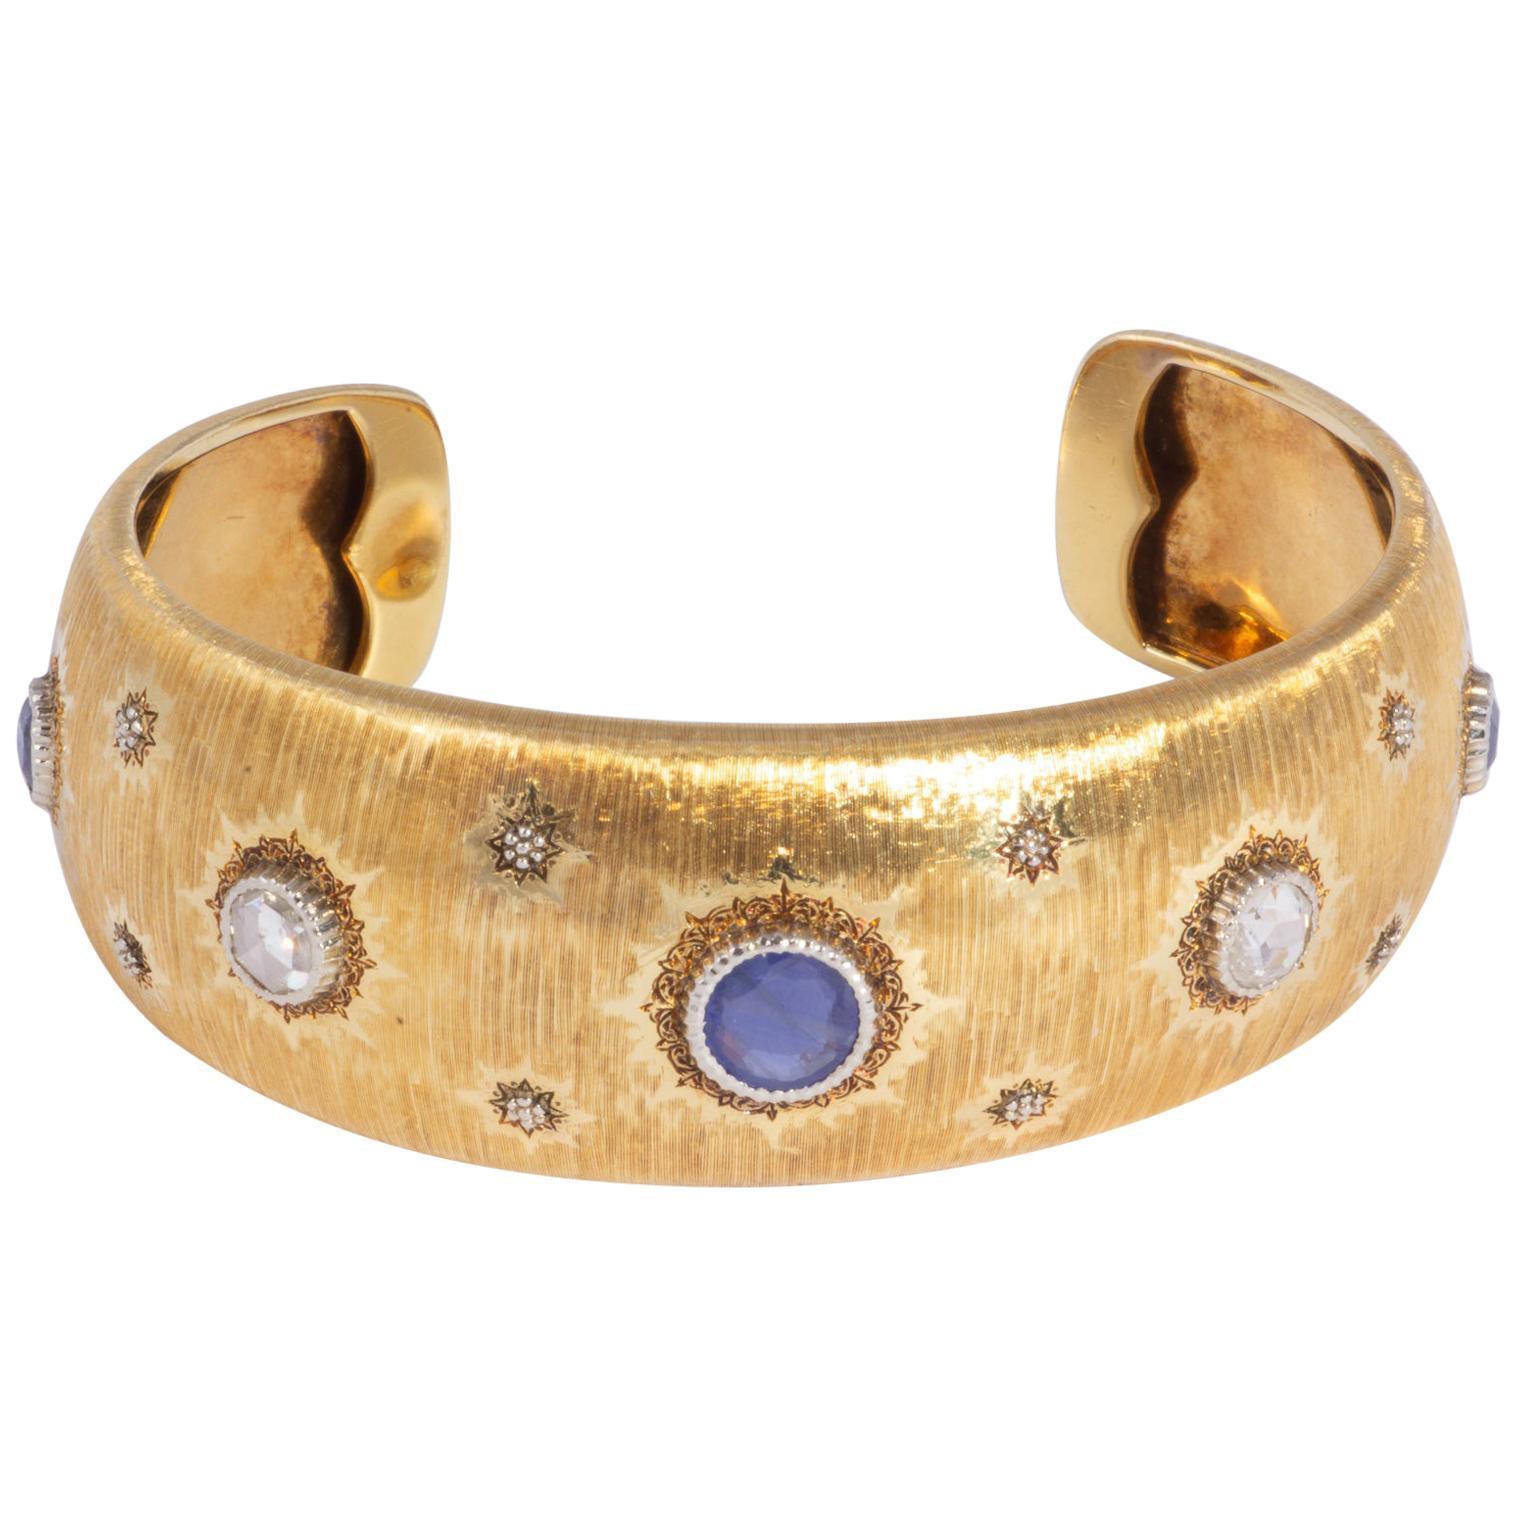 18k Mario Buccellati Gold And Diamond Cuff Bracelet